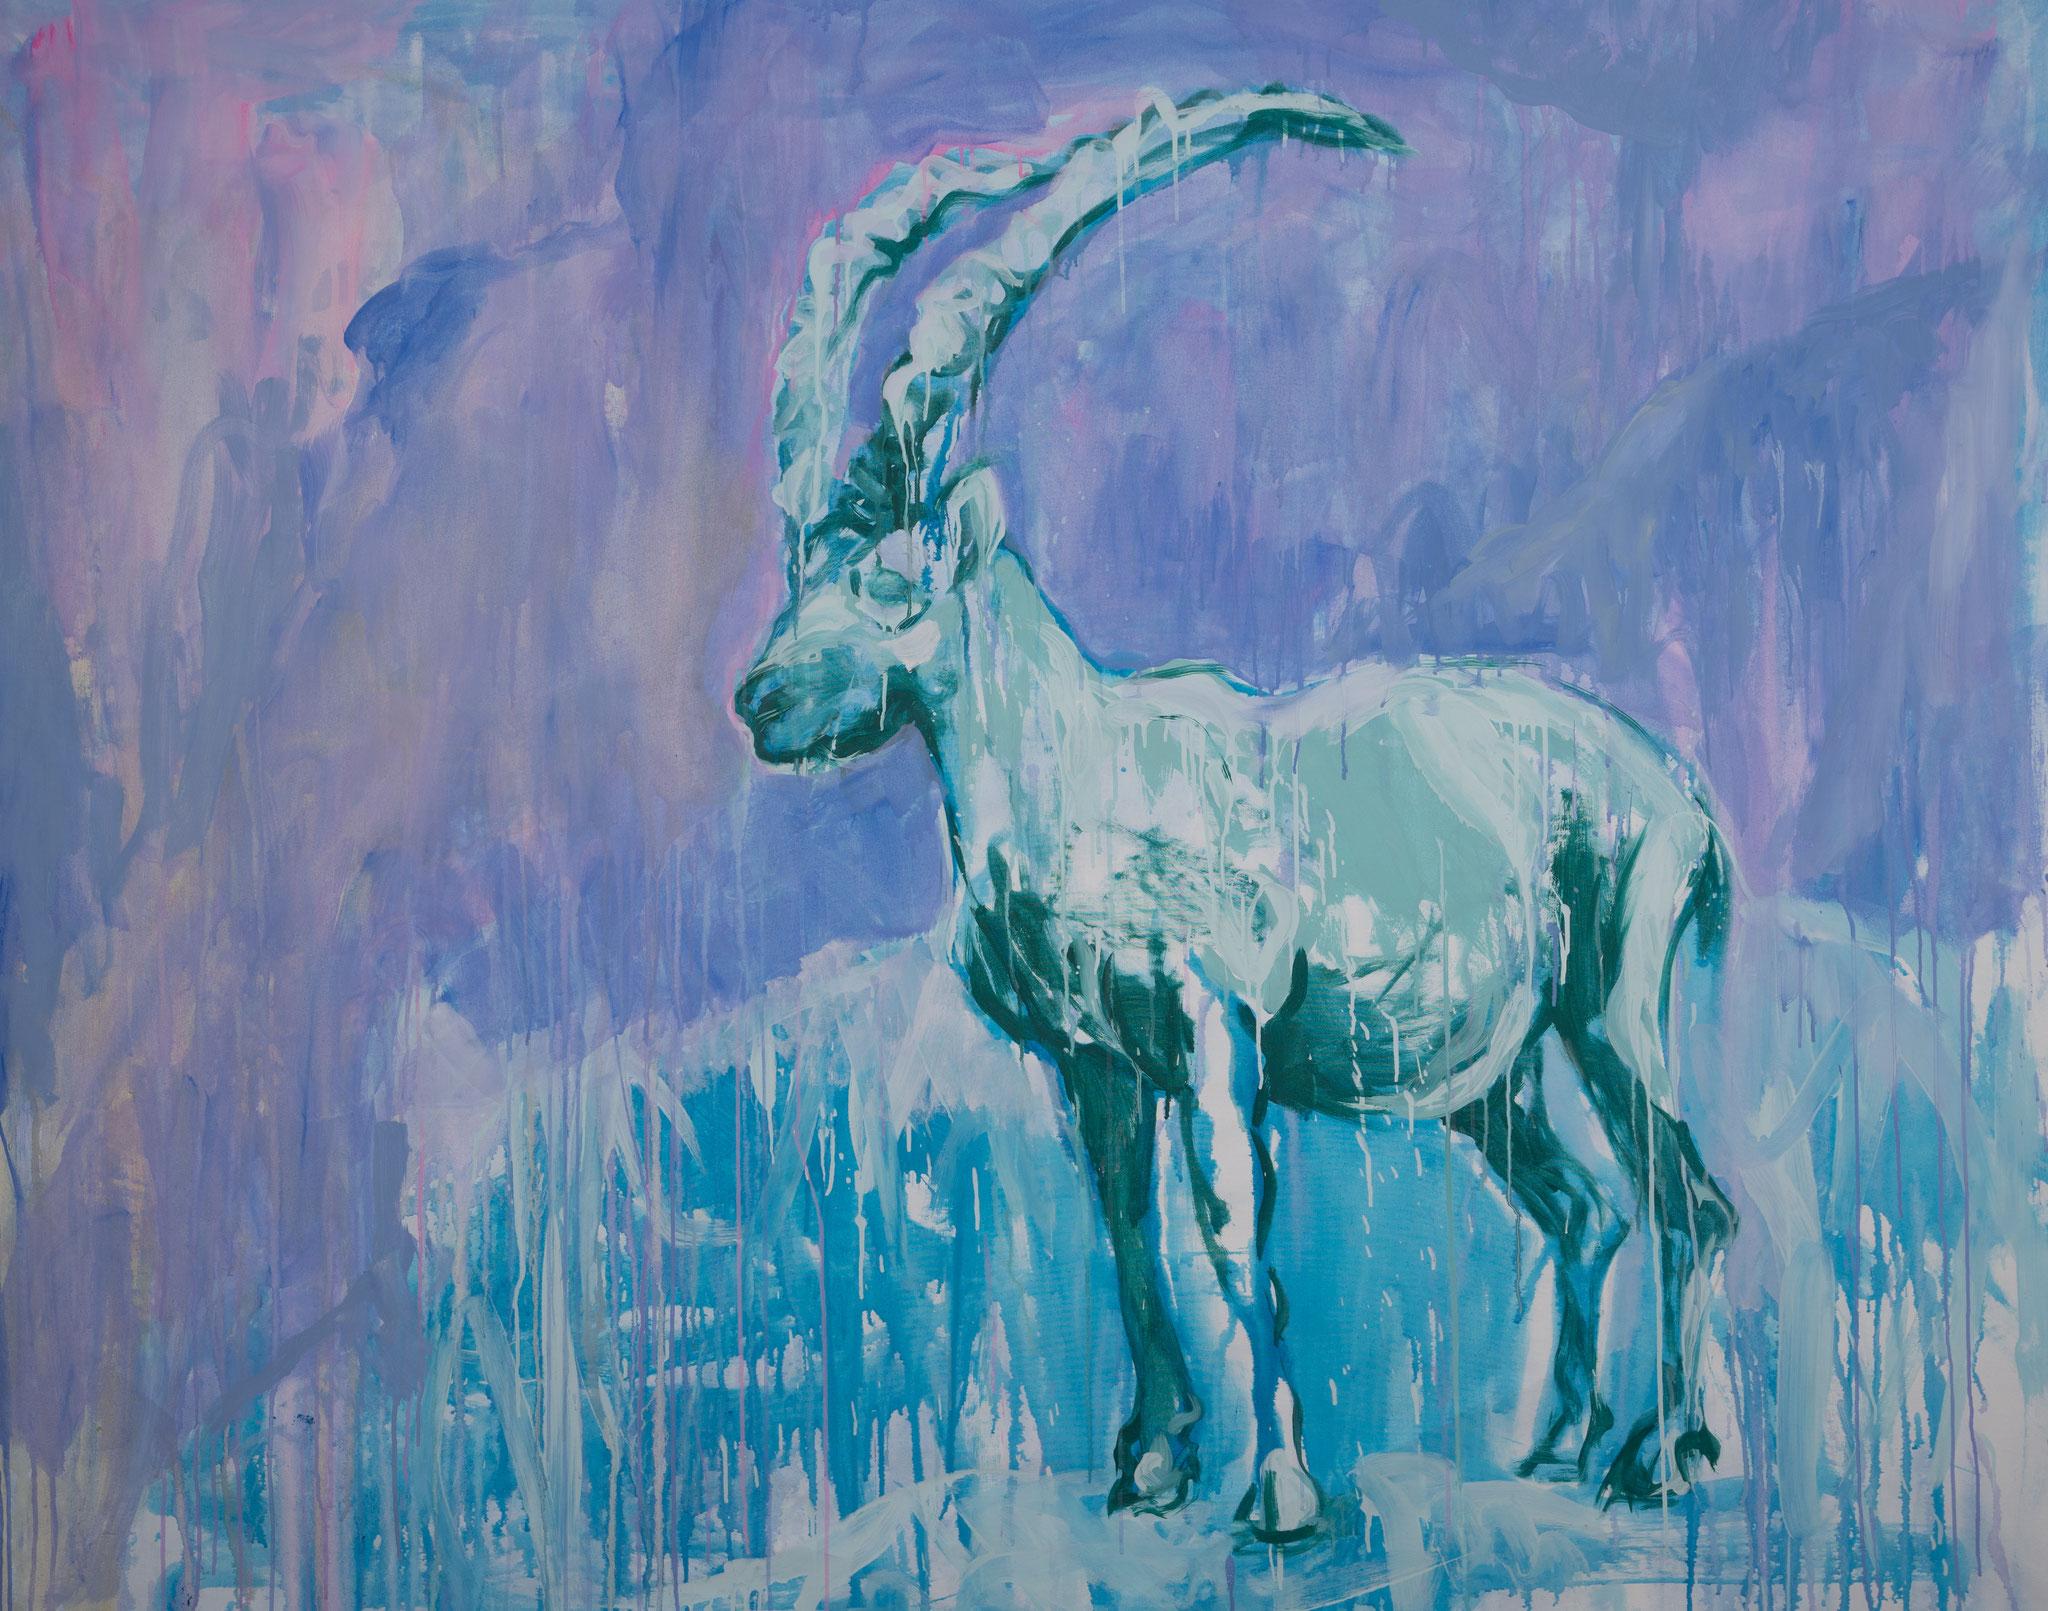 """Bock"" 160 x 200 cm - Acryl auf Leinwand"